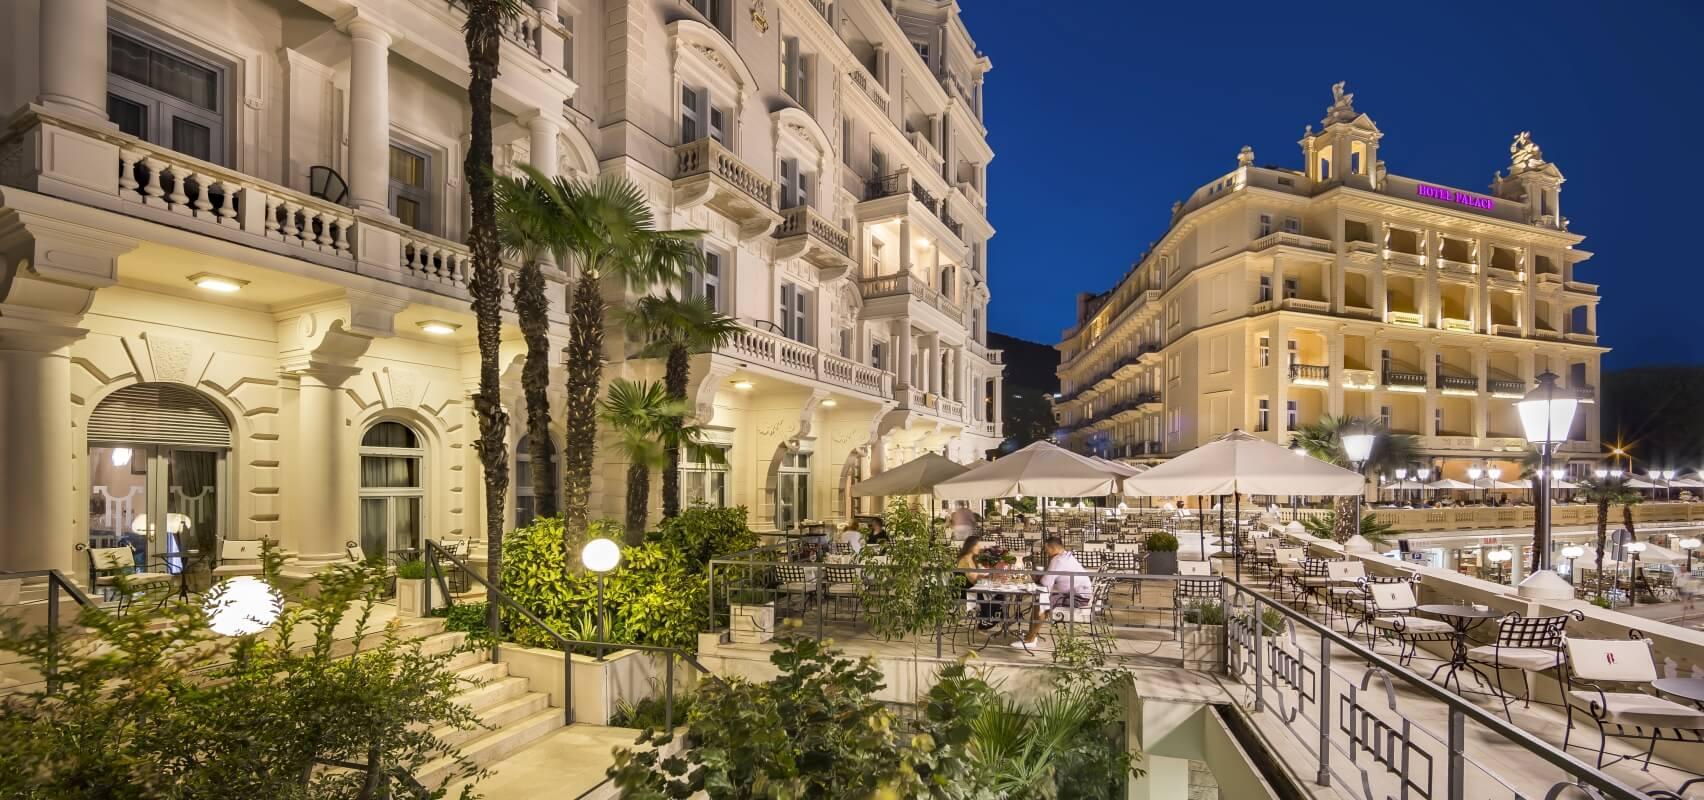 Grand Hotel Palace Opatija Croatia Remisens Hotels